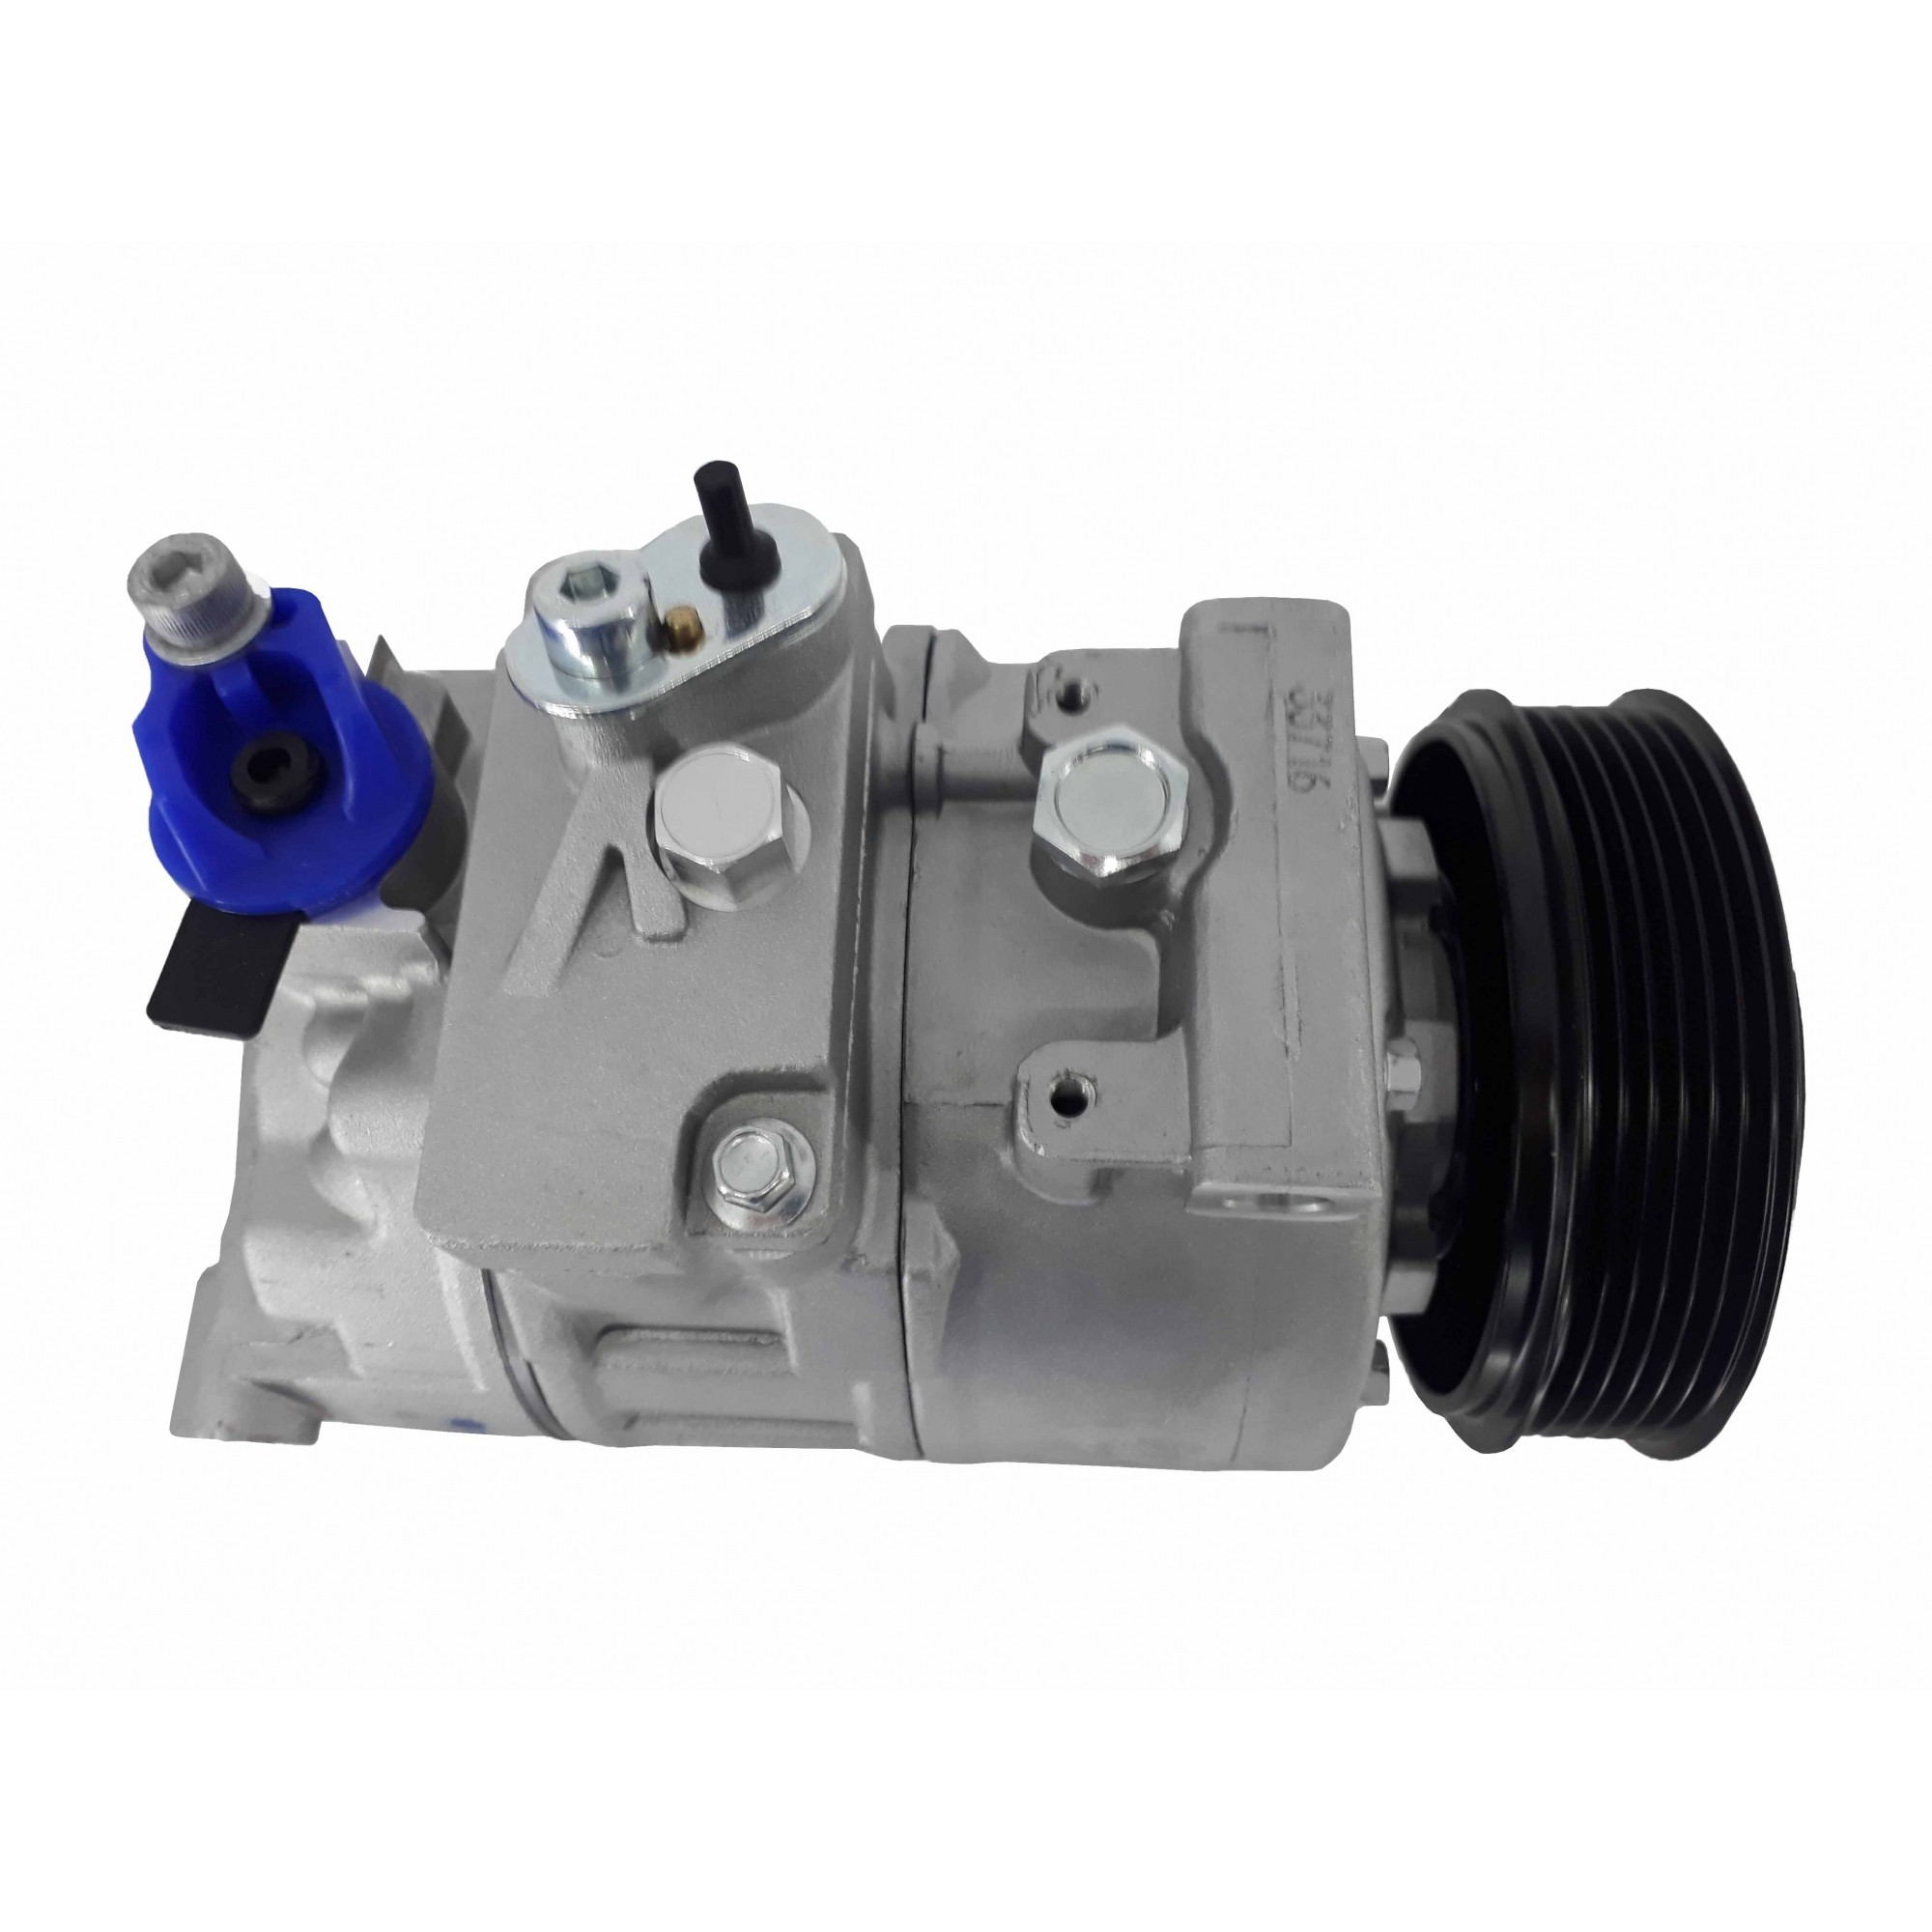 Compressor Golf / Jetta / Passat 2.0 - Original DELPHI